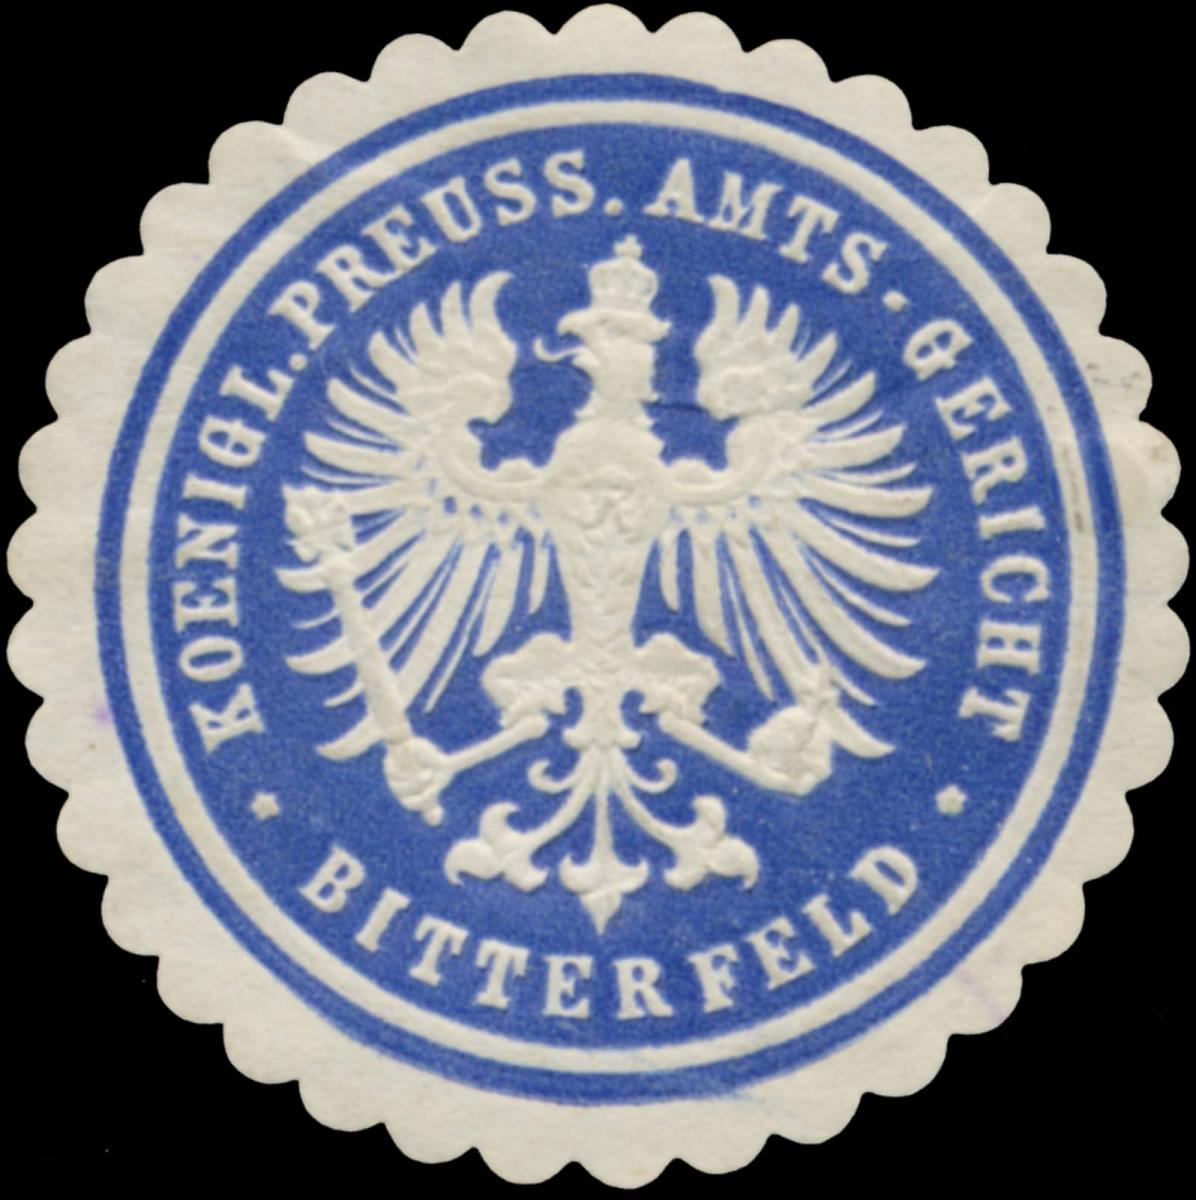 K.Pr. Amtsgericht Bitterfeld